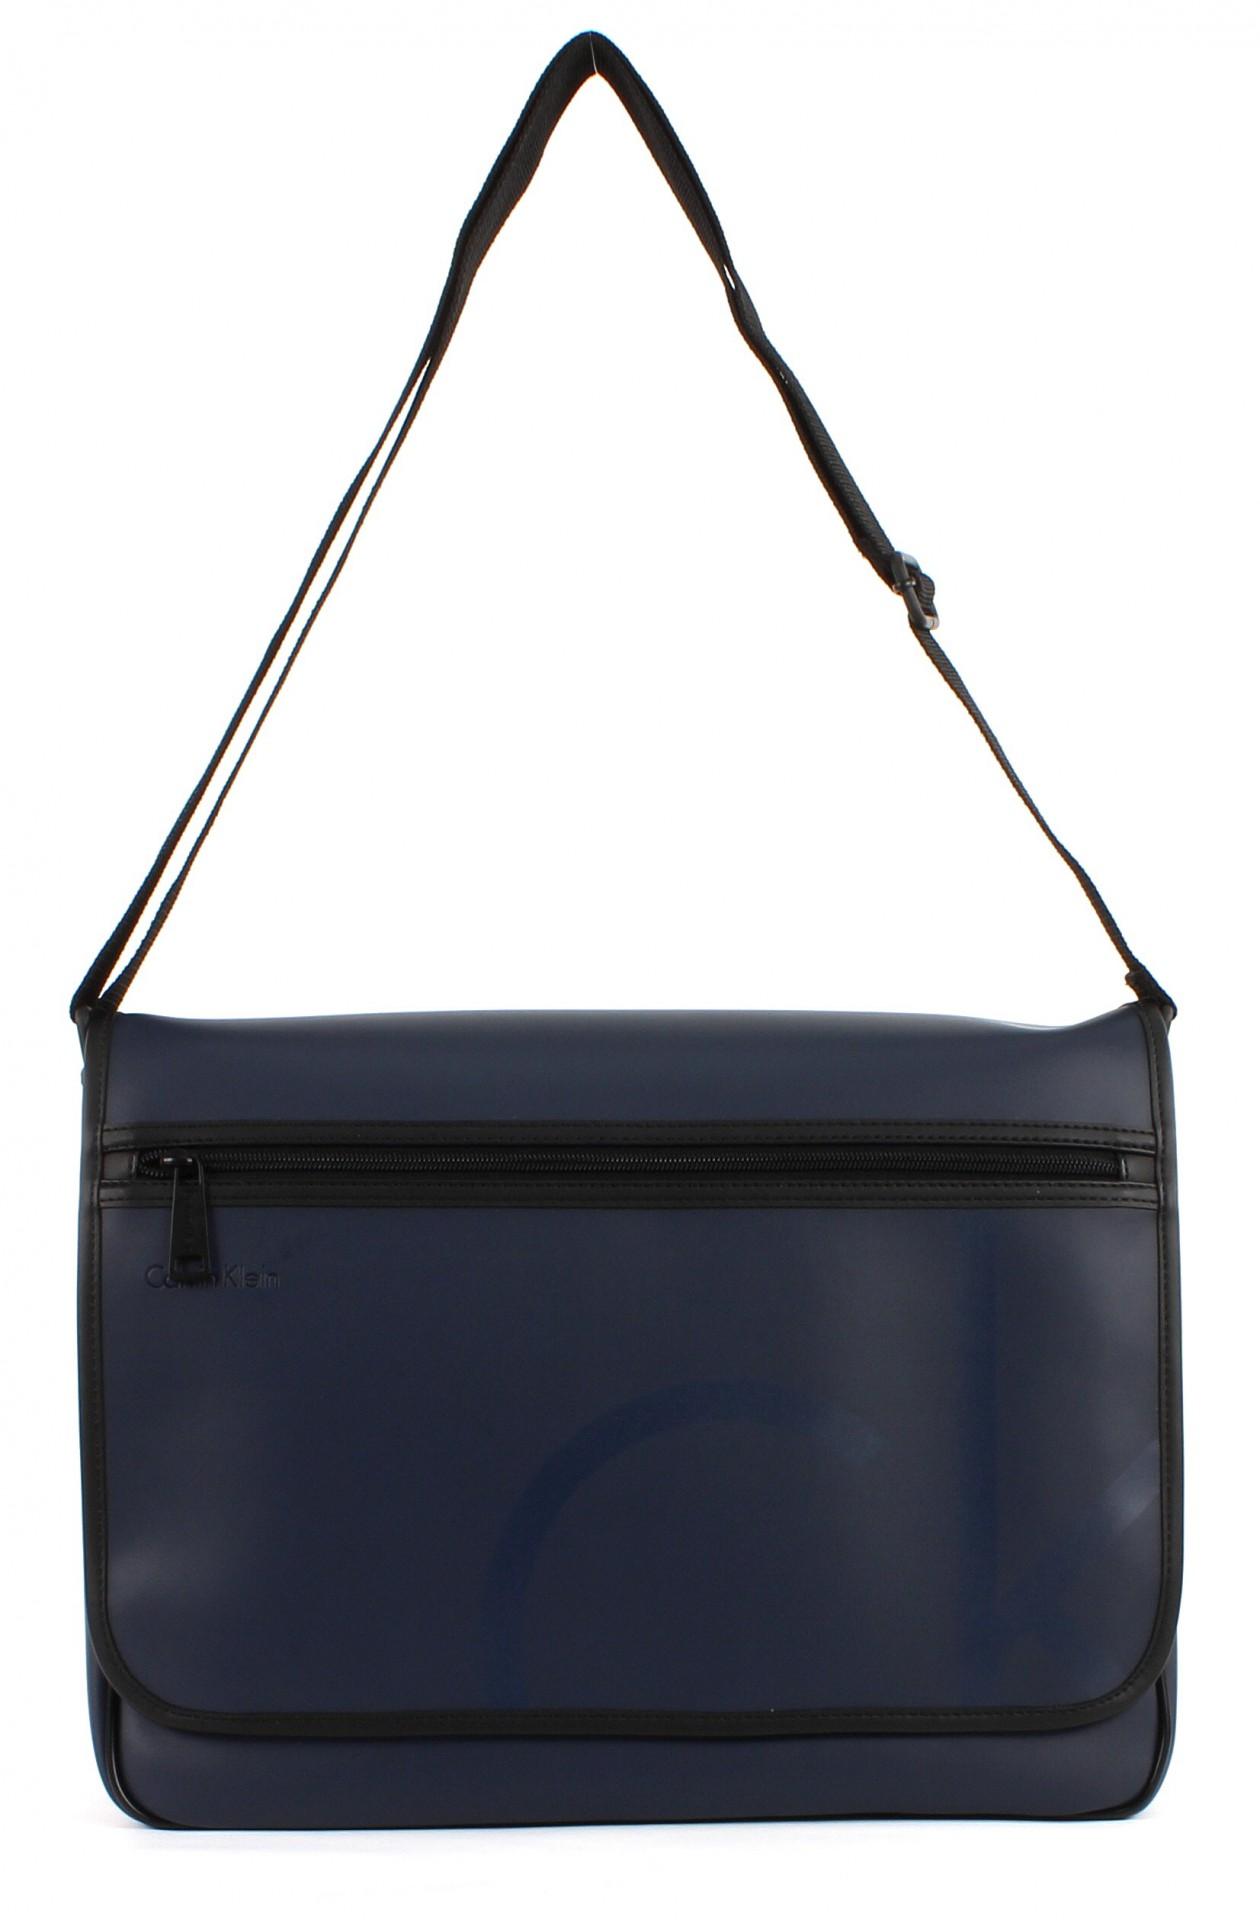 calvin klein voyager 2 messenger bag with flap eine aktentasche im. Black Bedroom Furniture Sets. Home Design Ideas